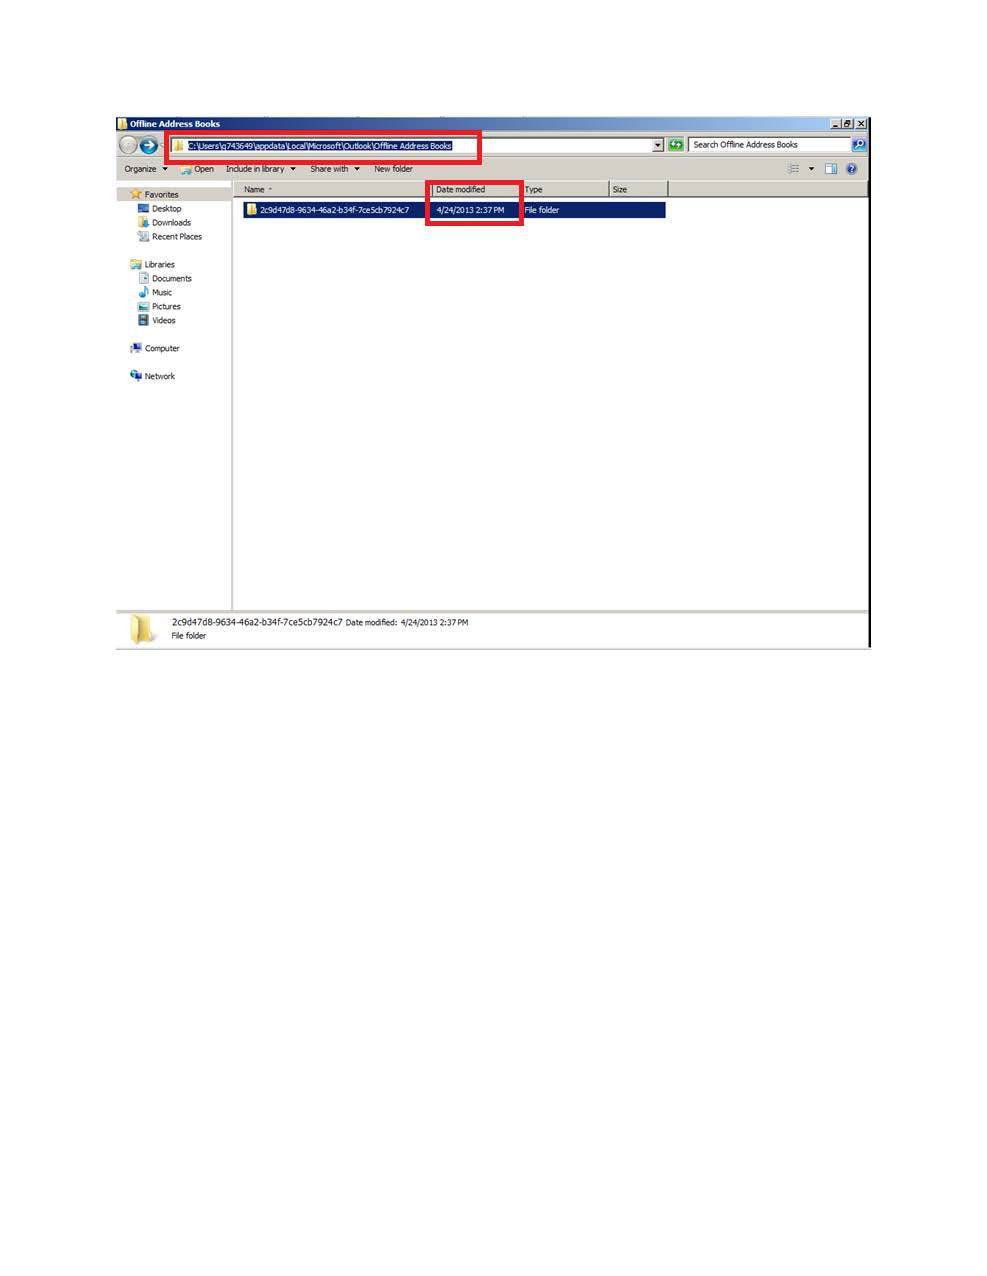 outlook download address book 2013